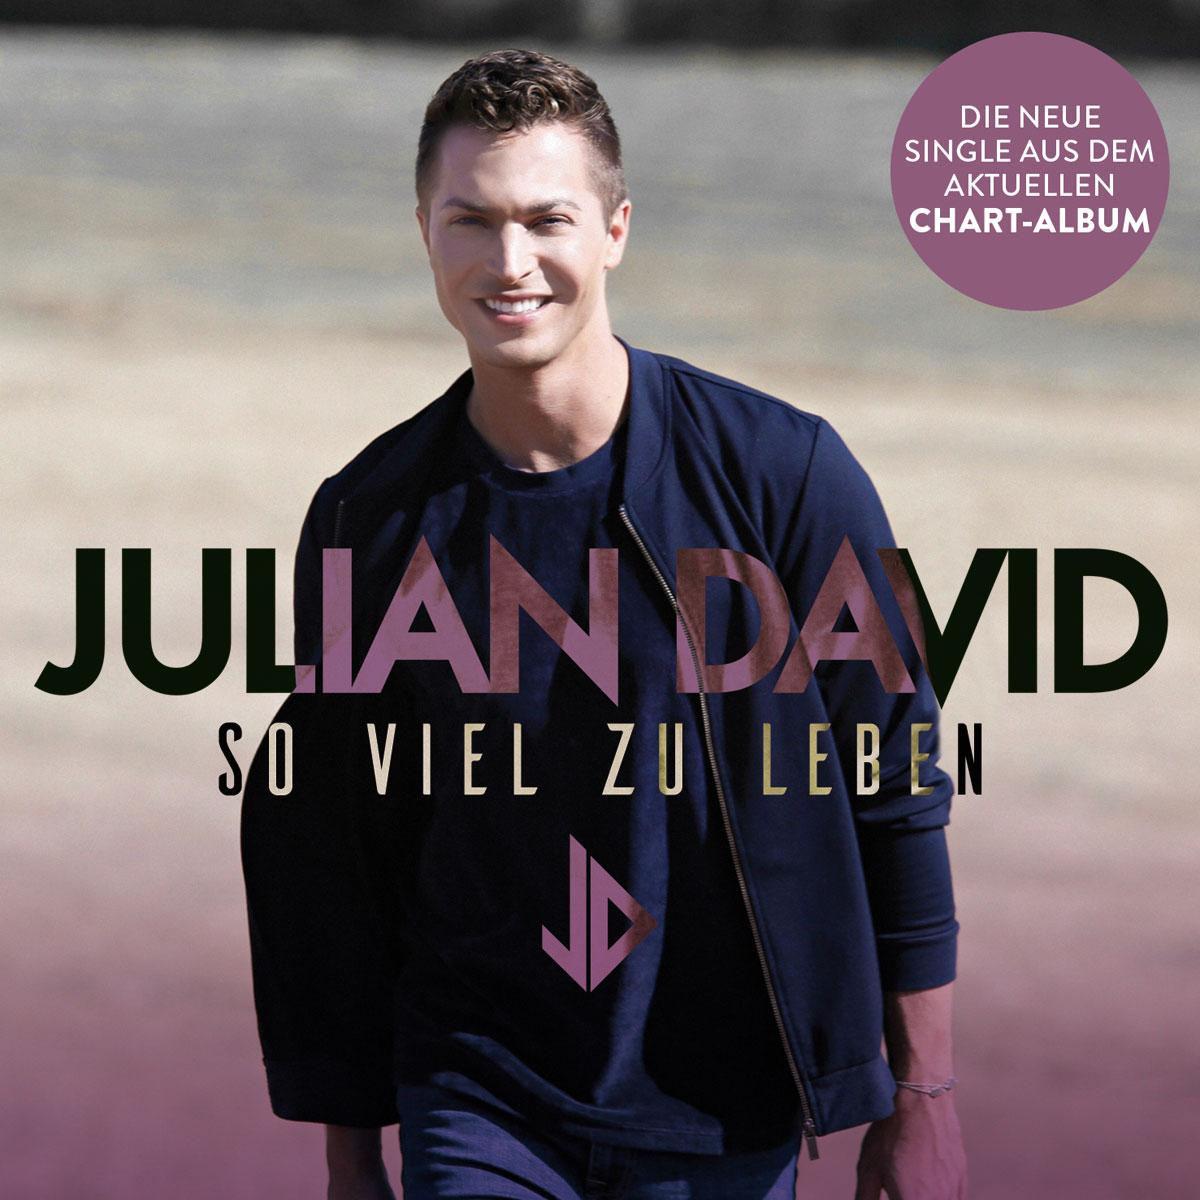 Julian David - So viel zu leben